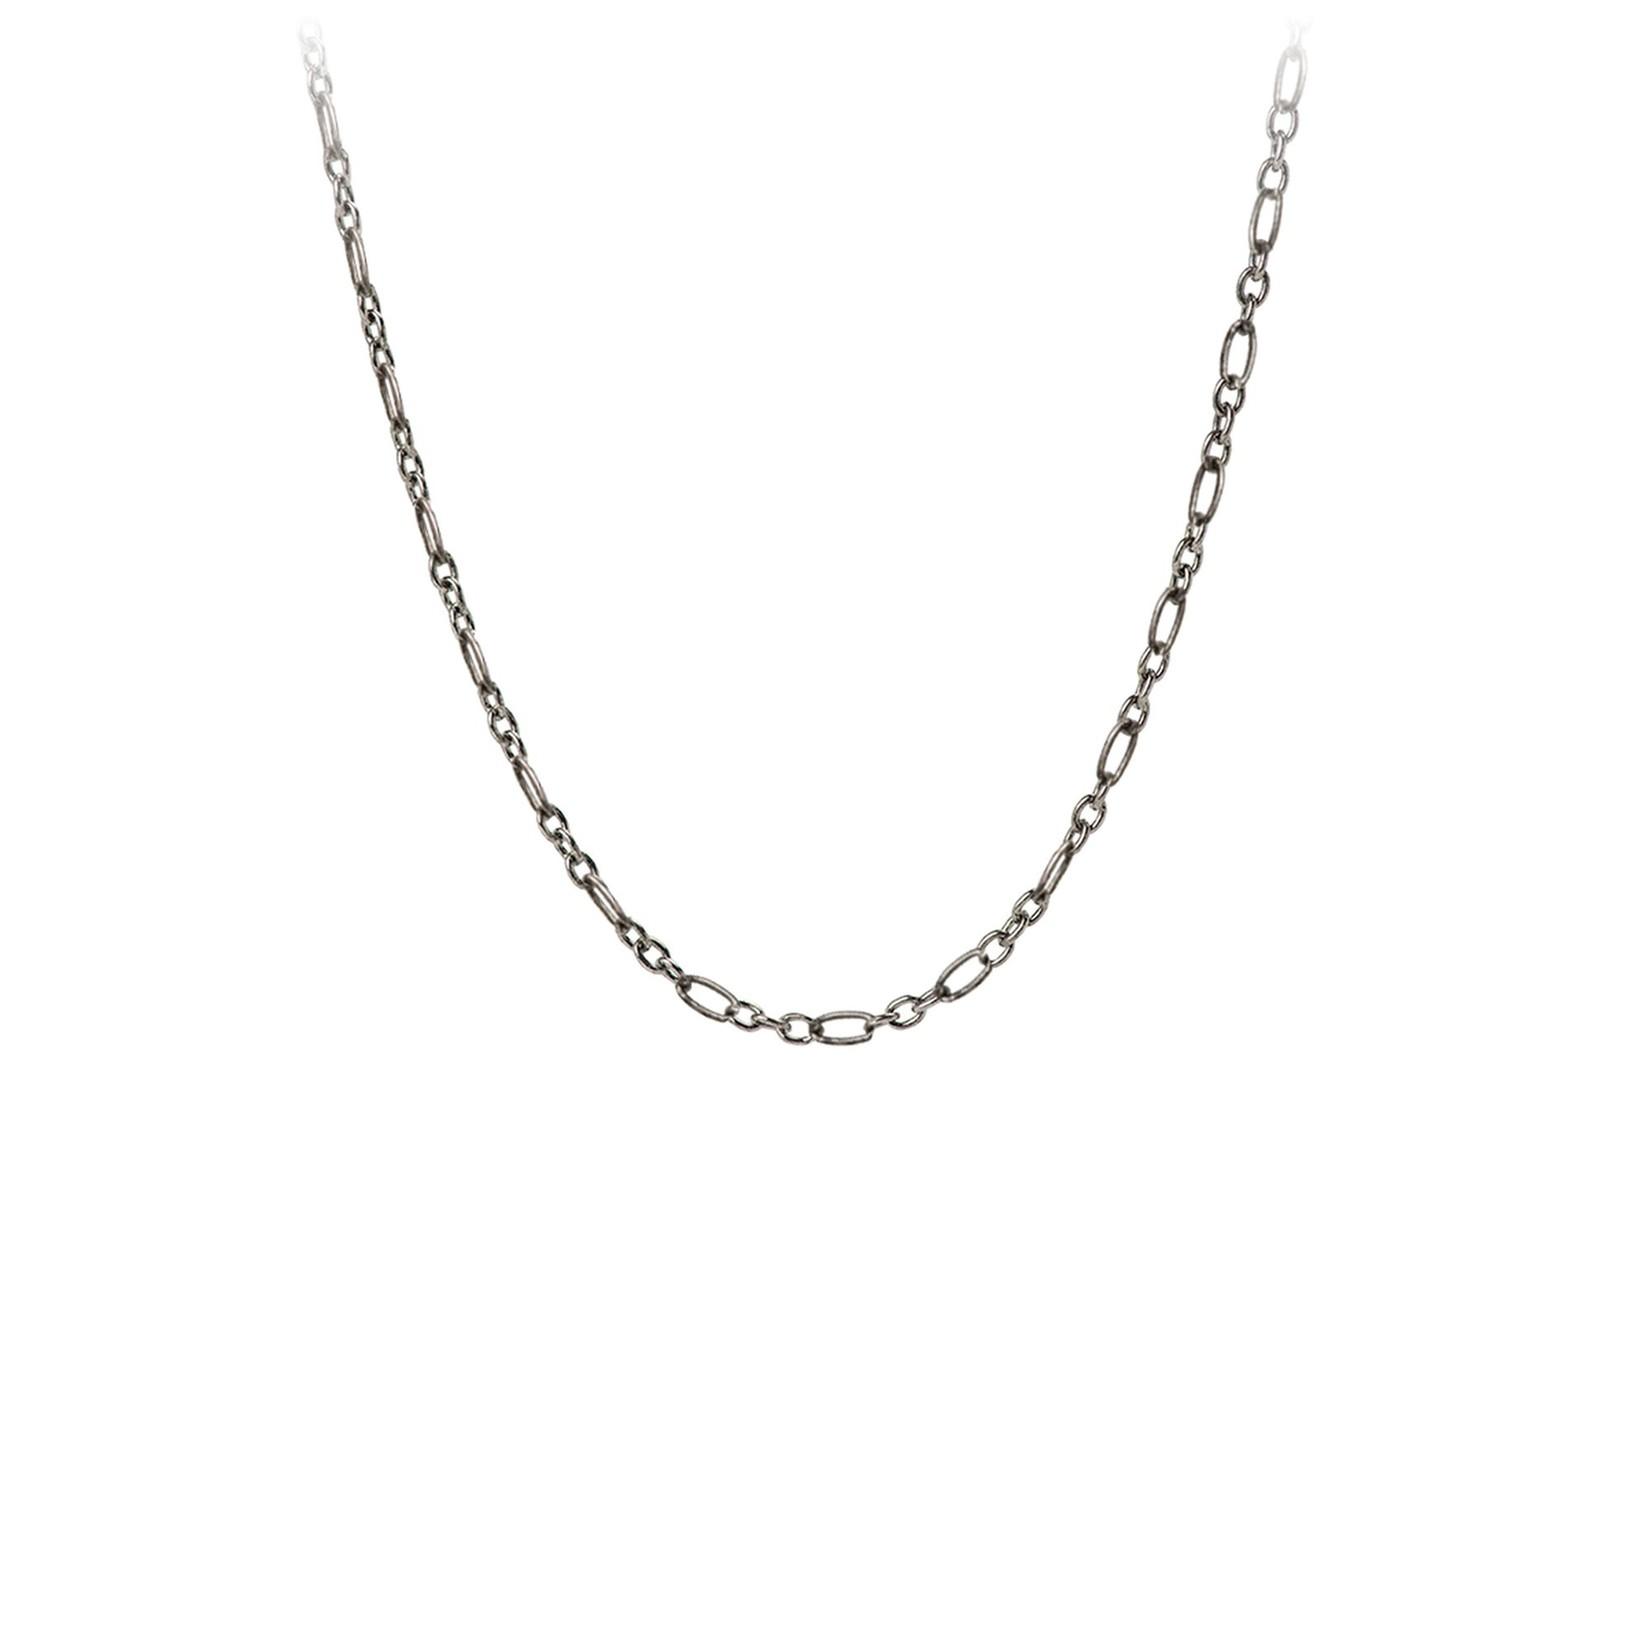 Pyrrha Oxidized Sterling Silver Medium Anchor Chain